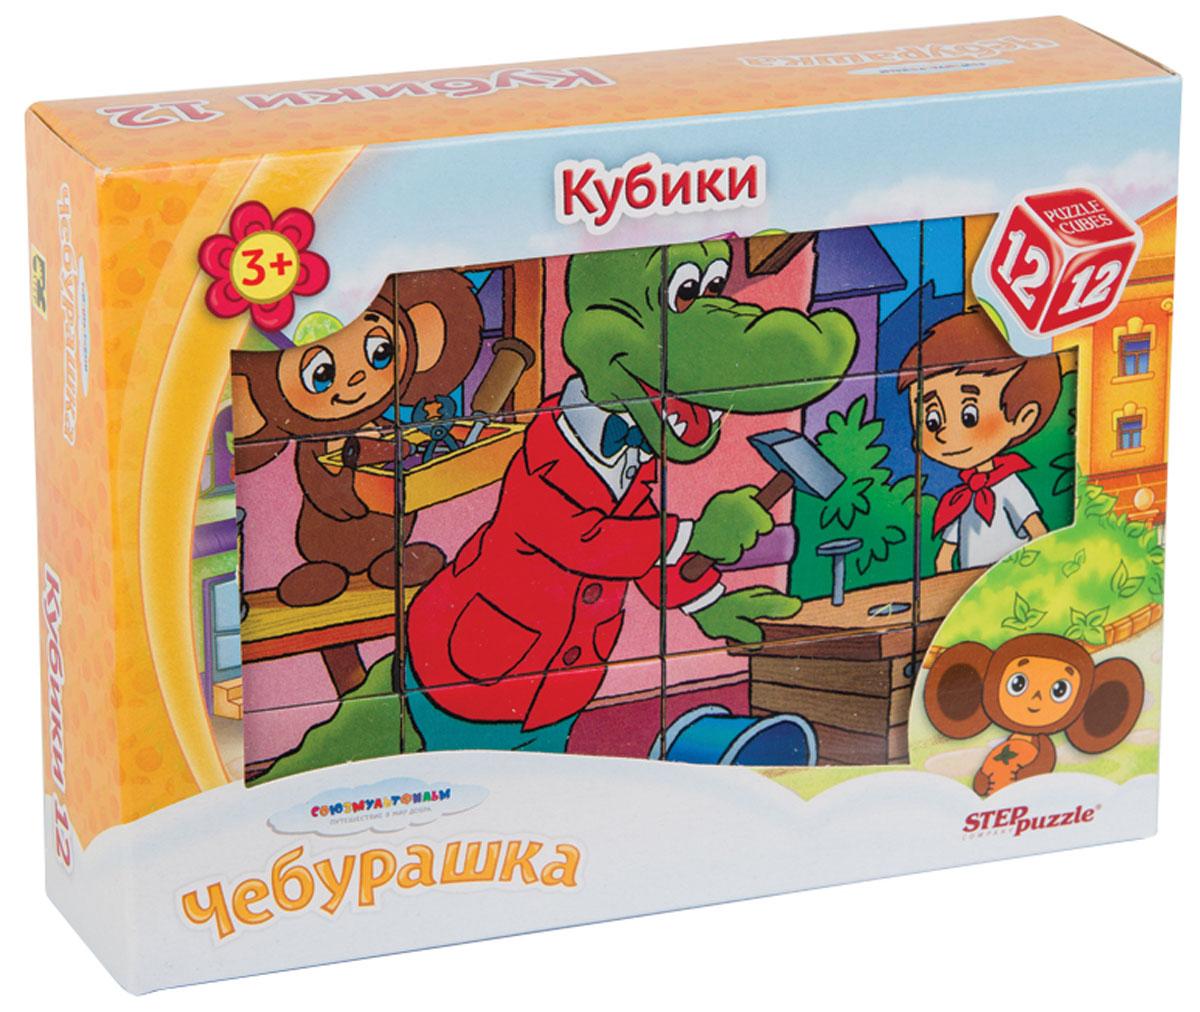 Step Puzzle Кубики Чебурашка